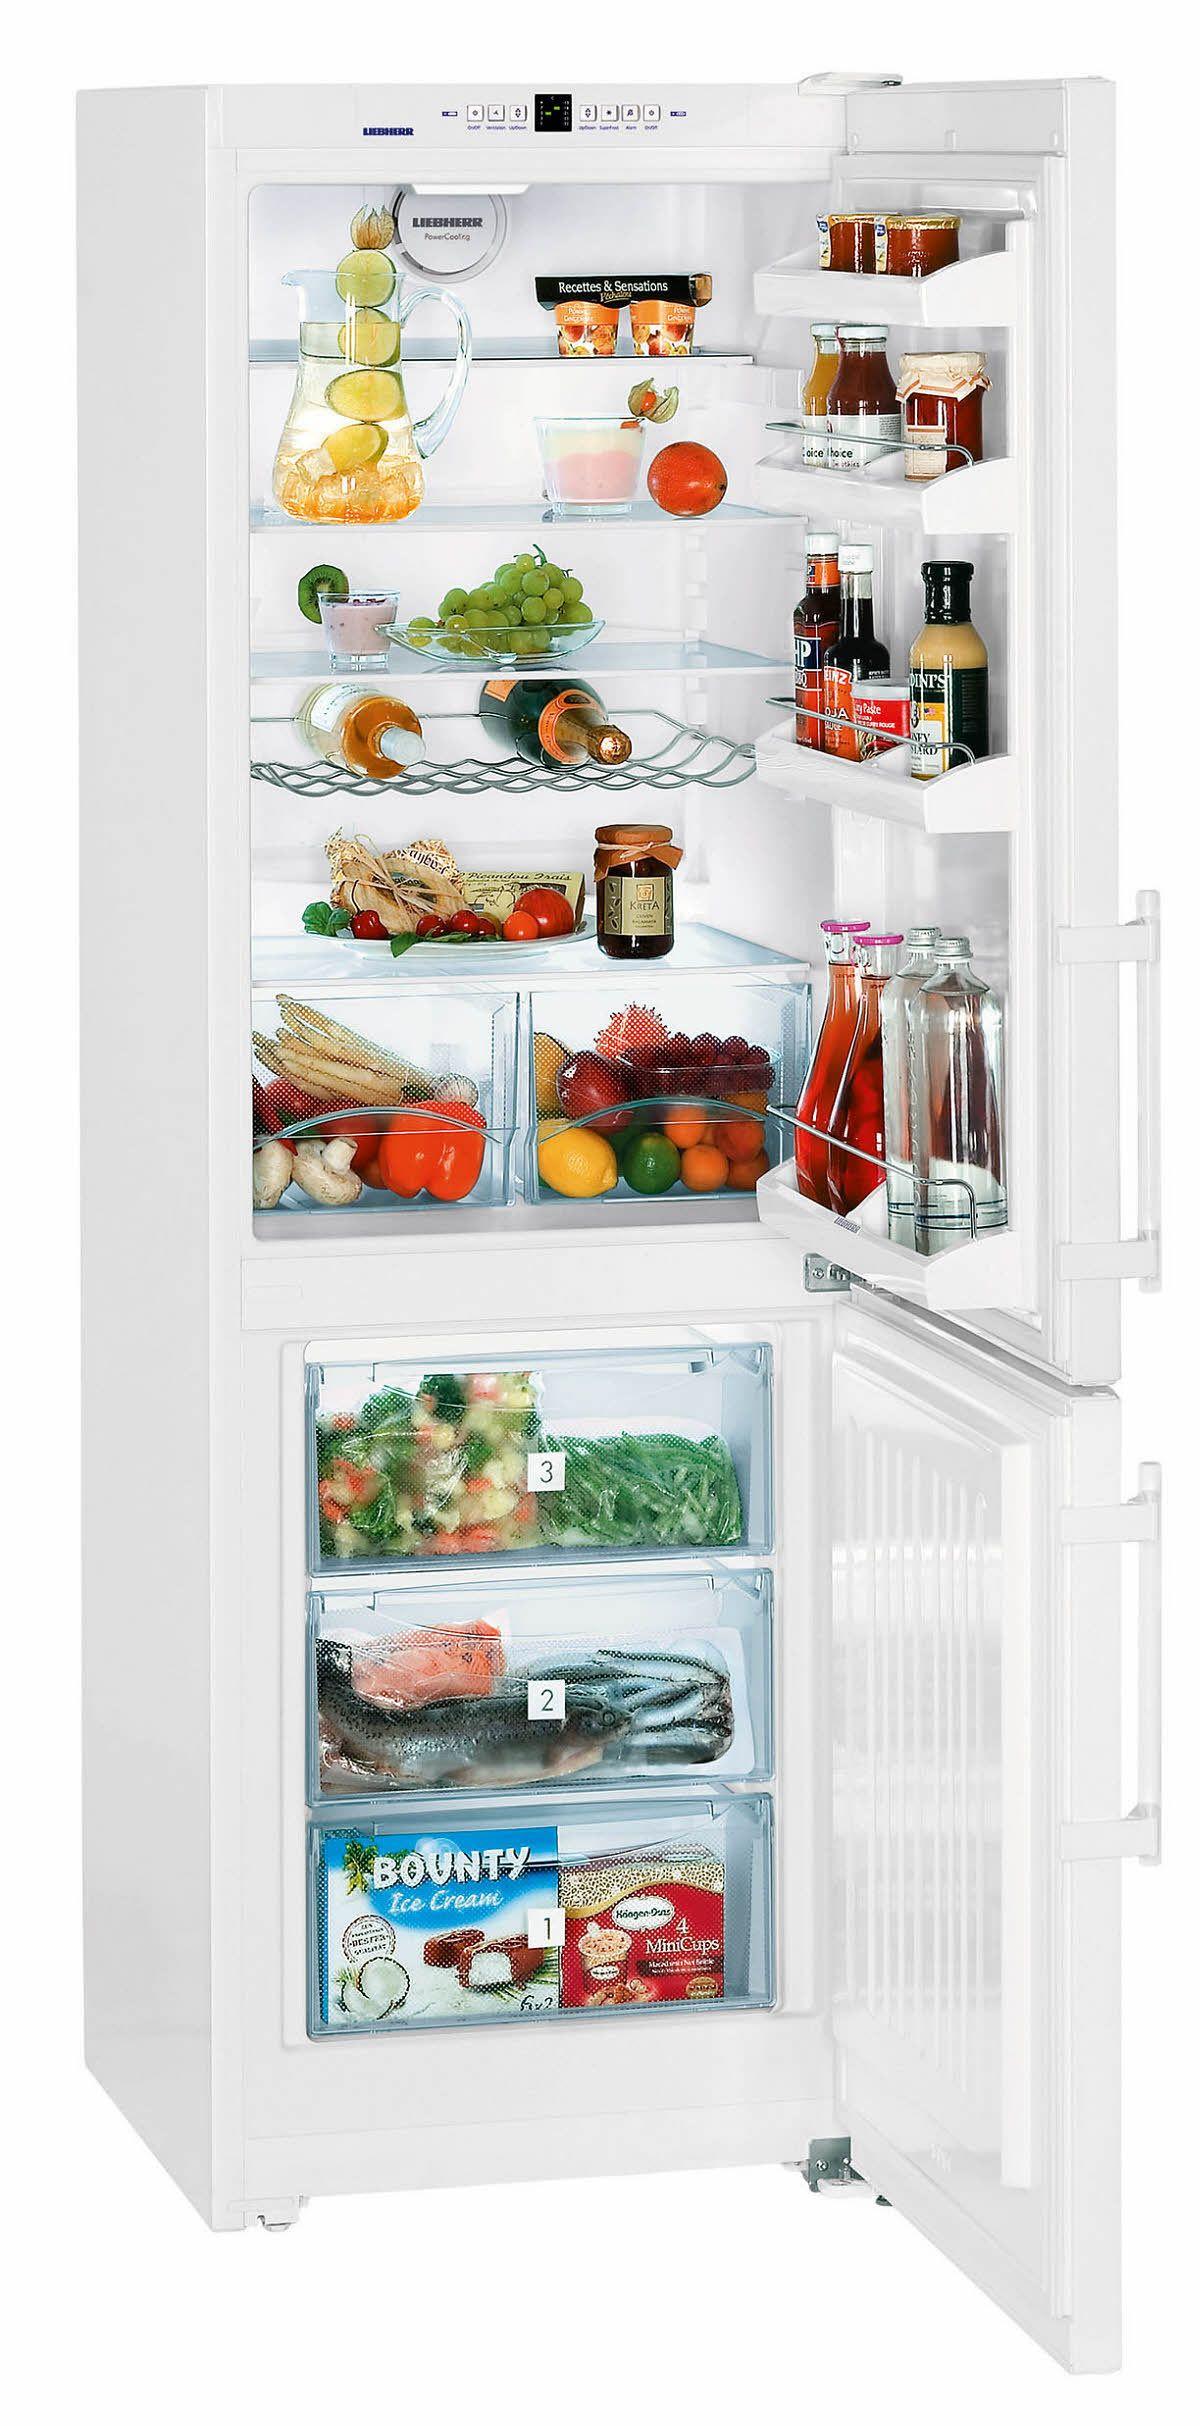 Холодильник LIEBHERR C 3523-23 001Холодильники<br><br><br>Артикул: C      3523-23 001<br>Бренд: Liebherr<br>Высота упаковки (мм): 1874<br>Длина упаковки (мм): 711<br>Ширина упаковки (мм): 617<br>Гарантия производителя: да<br>Вес упаковки (кг): 77,5